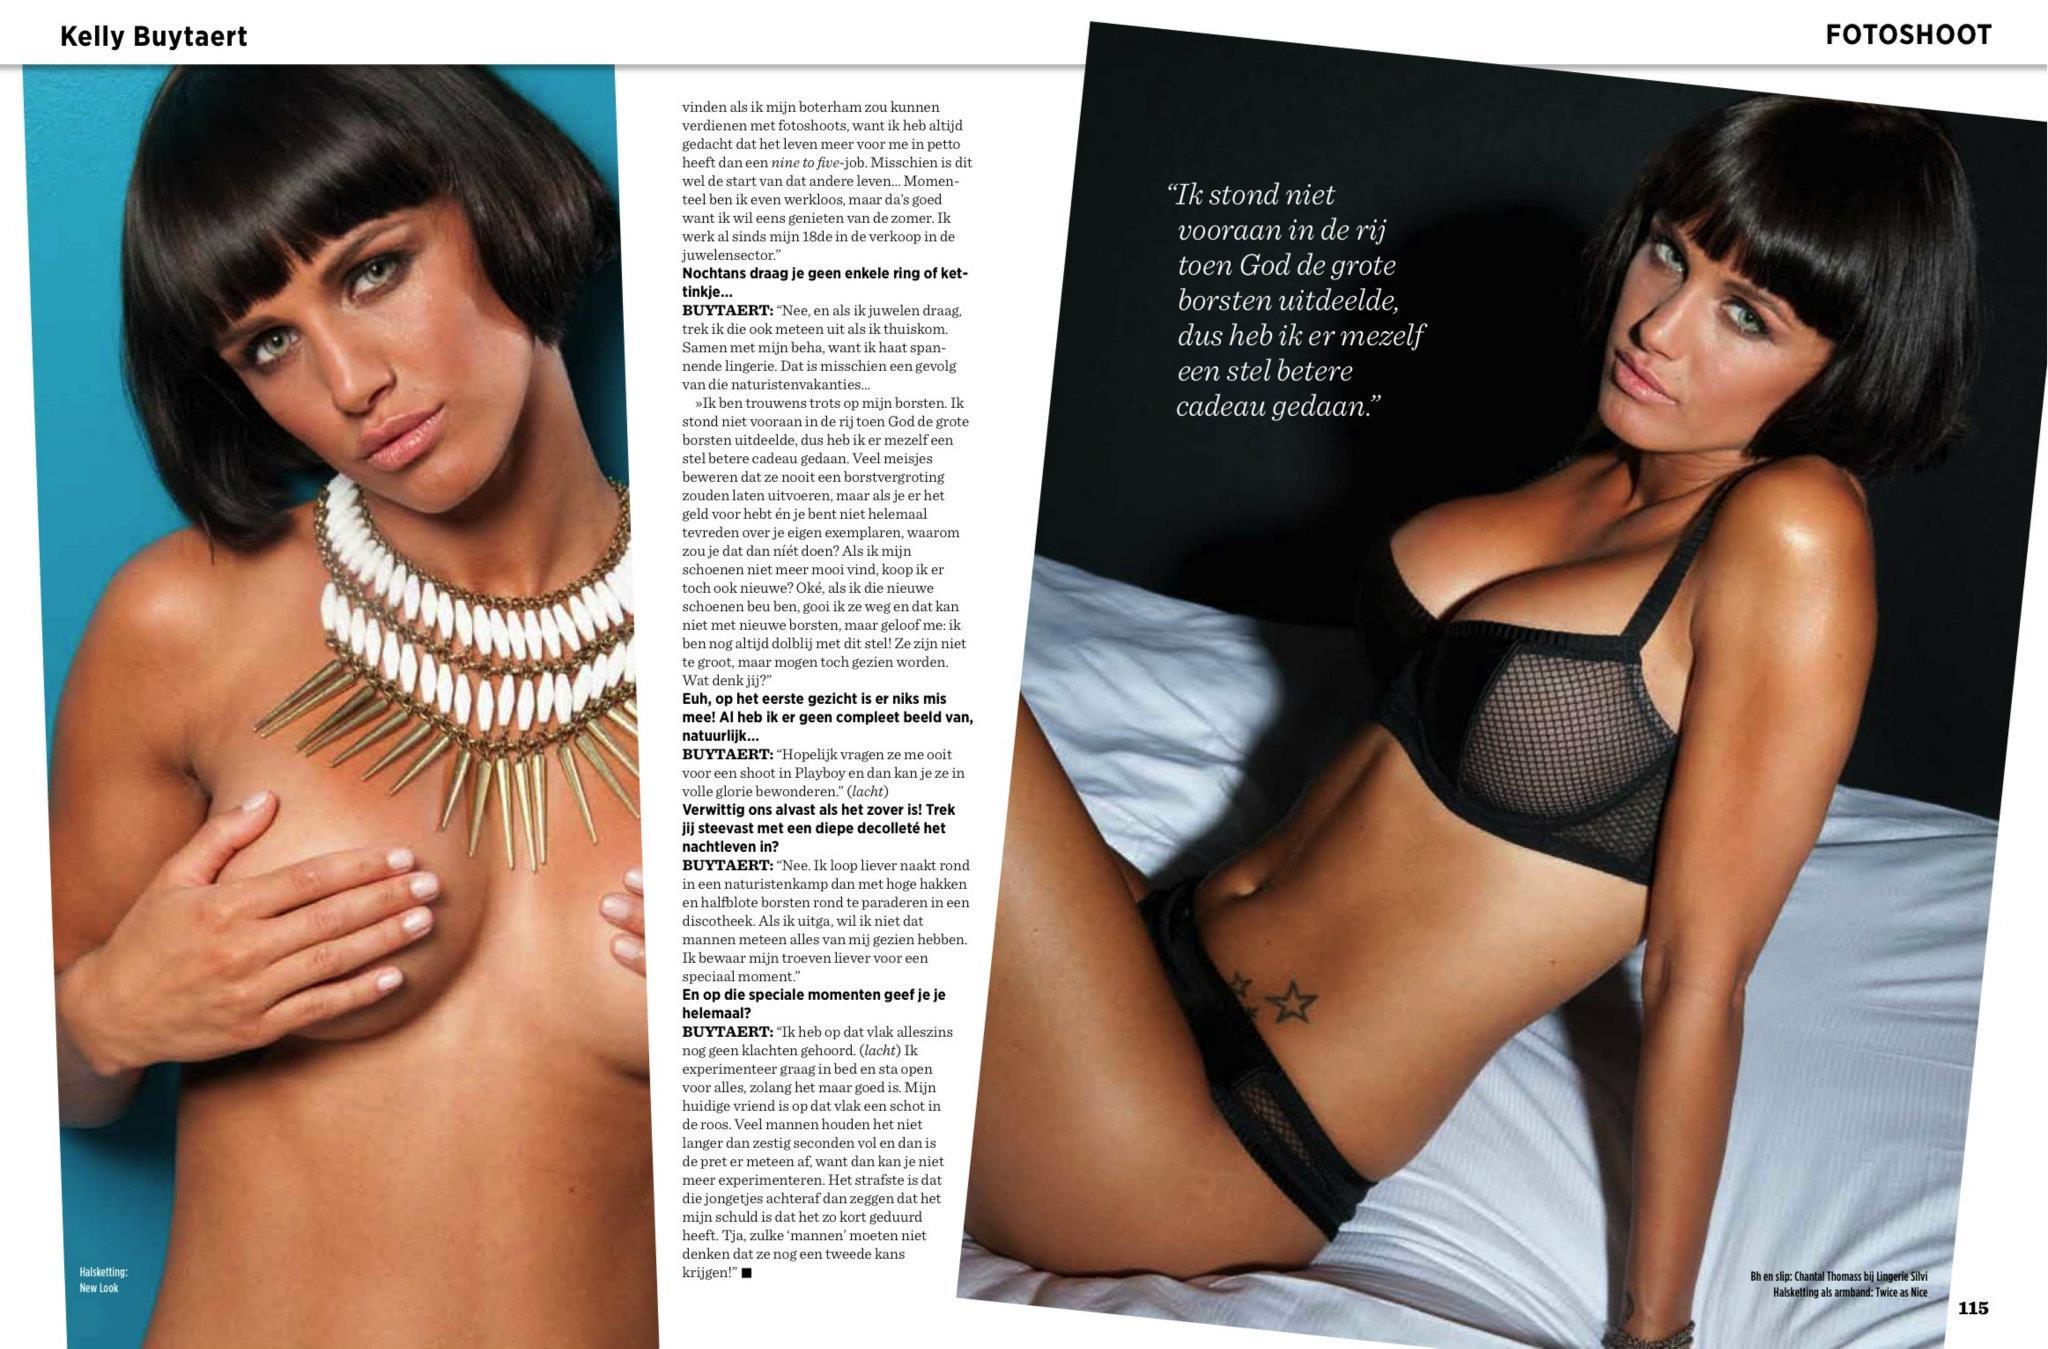 bart albrecht fotograaf photographer belgium p magazine che playboy editorial magazines glamour boudoir daniela degraux kelly buytaert 0009.jpg